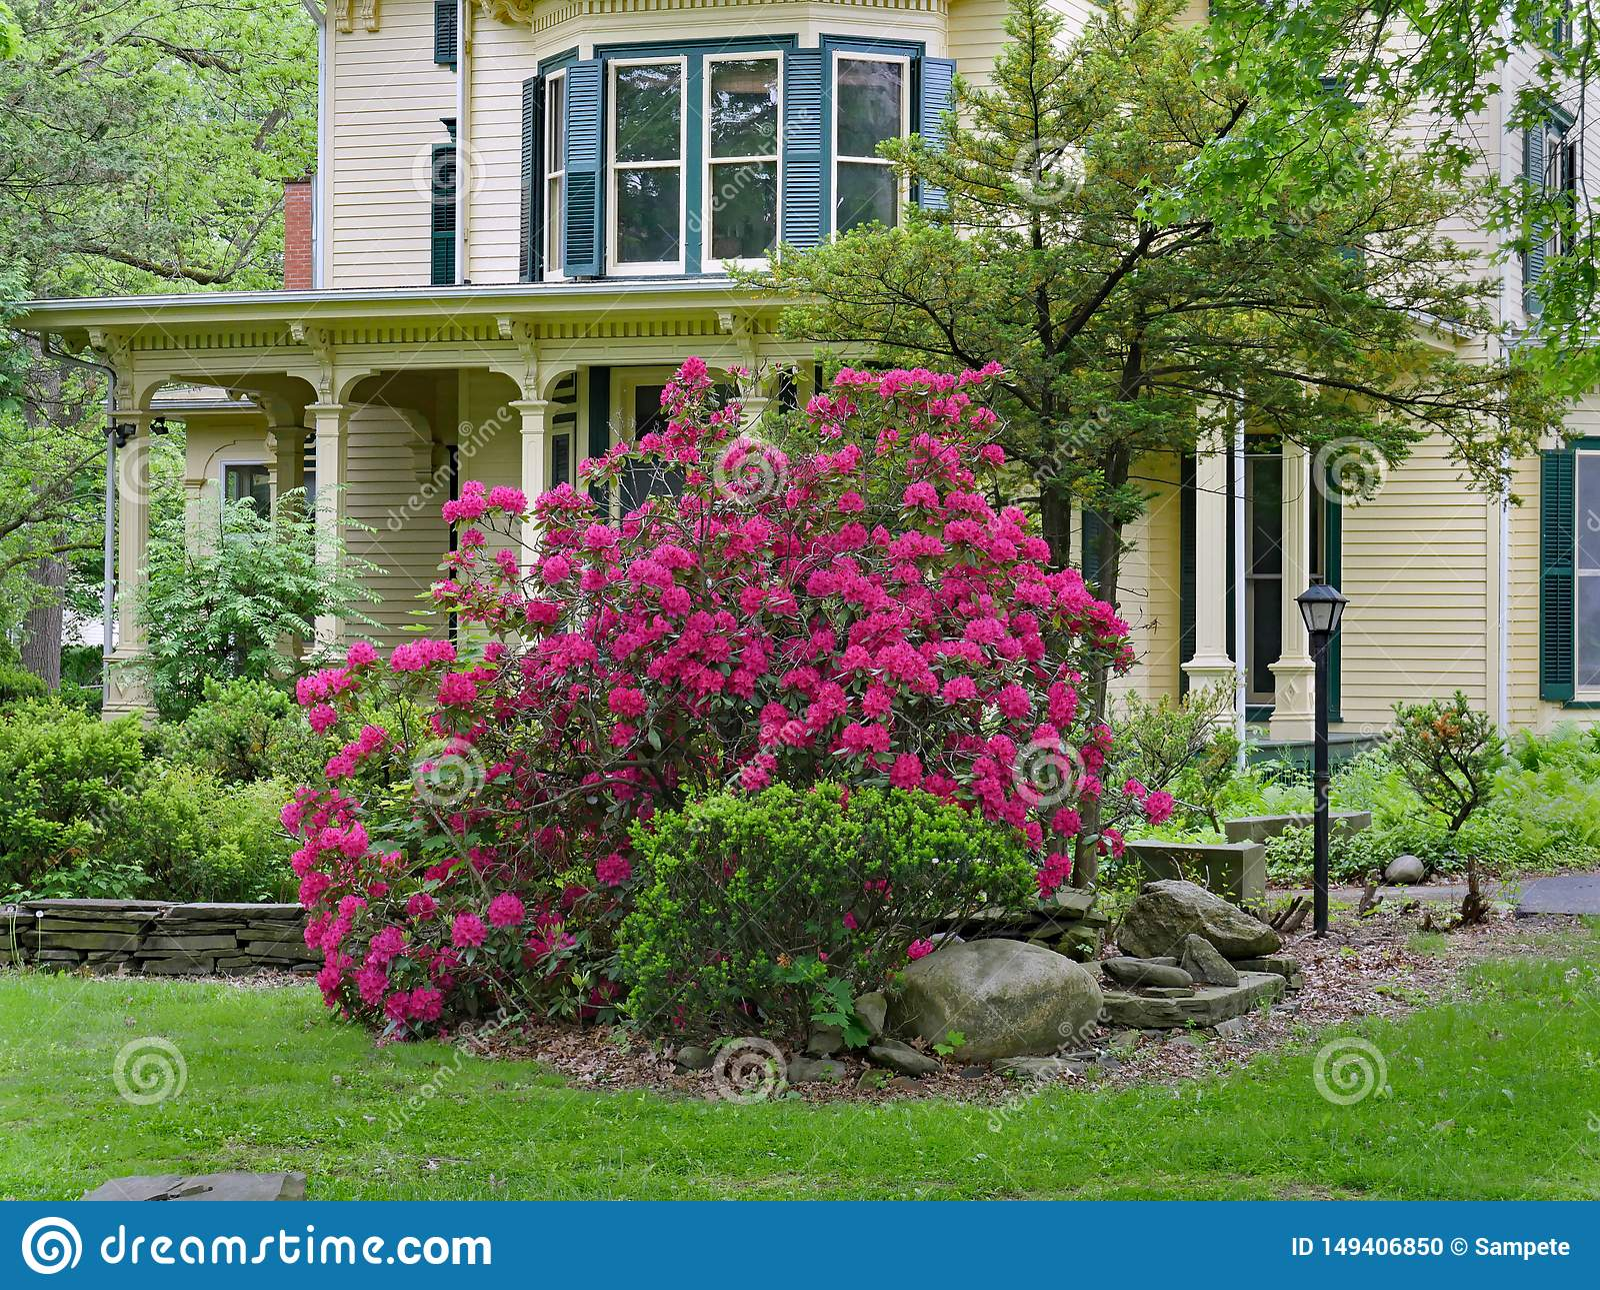 Purple rhododendron bush in bloom